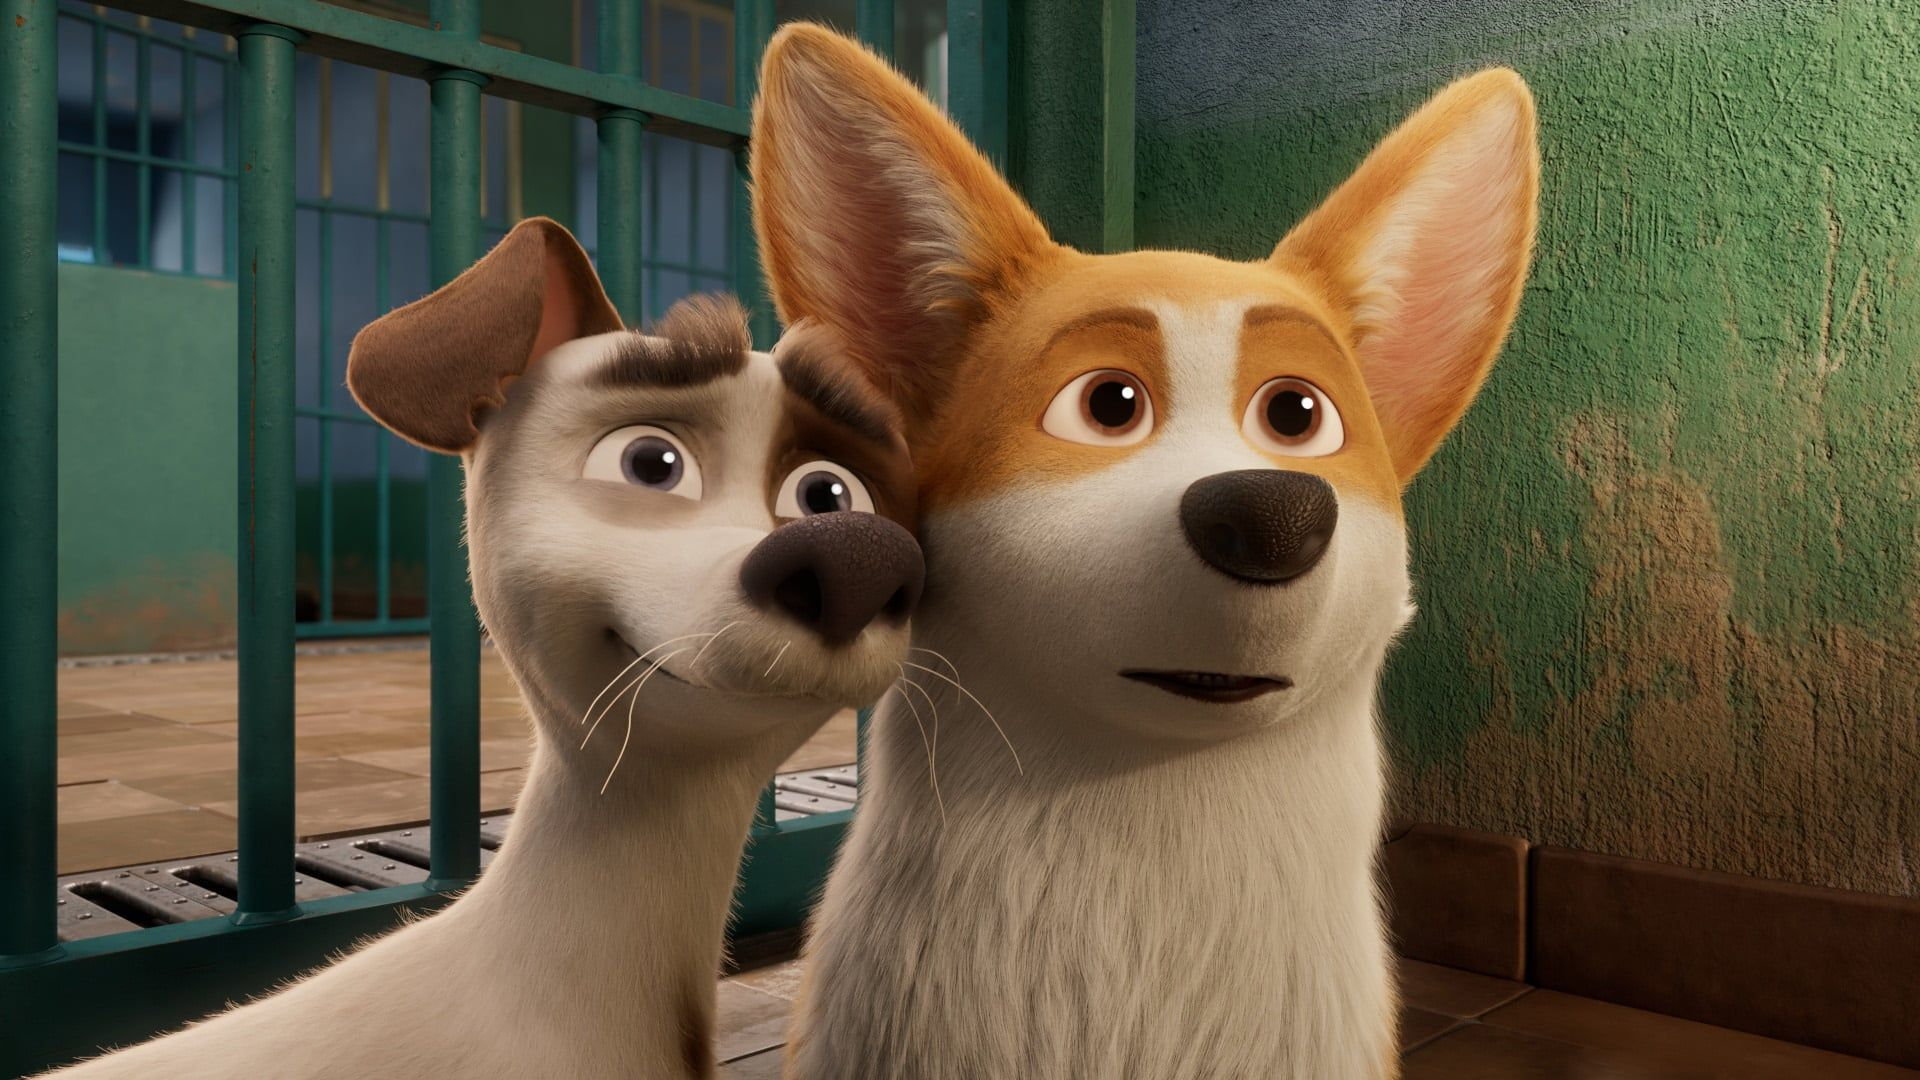 Corgi Las Mascotas De La Reina 2019 Putlocker Film Complet Streaming Rex Es El Perrito Co New Animation Movies Best Movies On Amazon Free Disney Movies Online